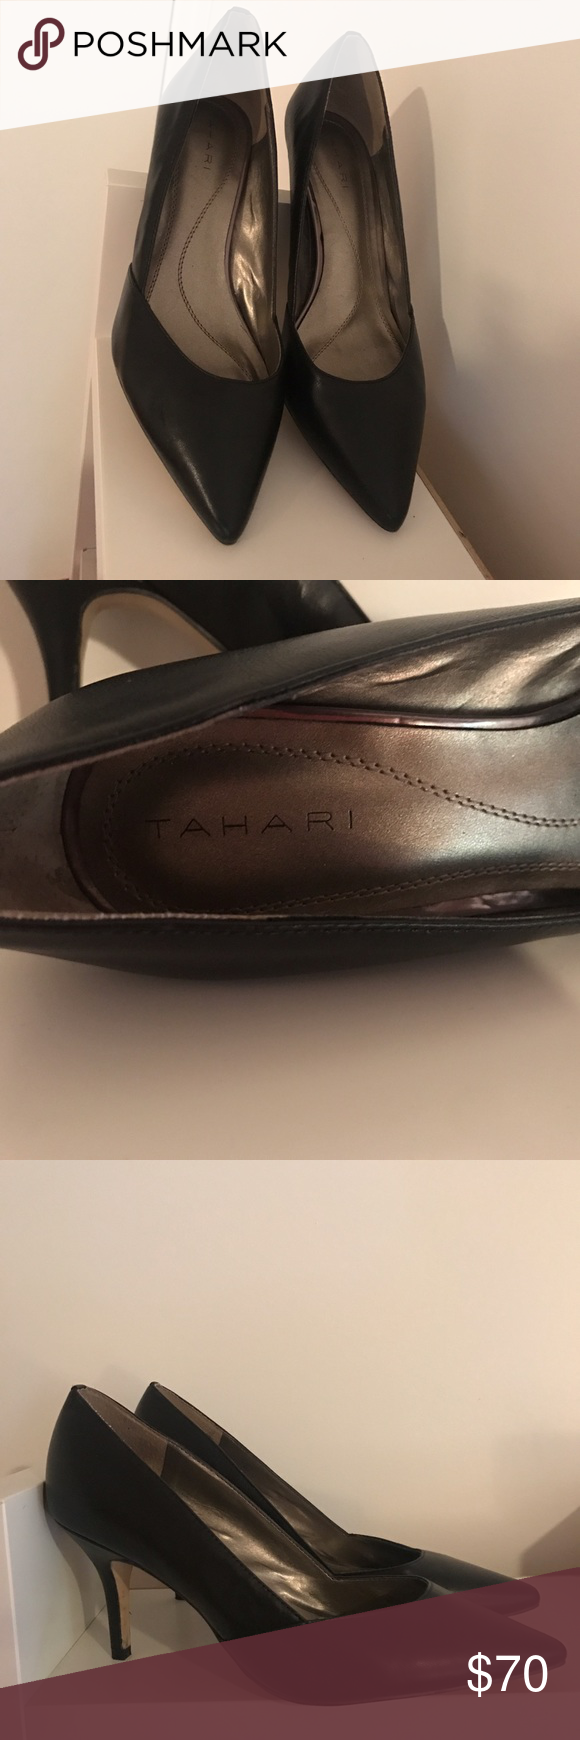 Tahari black shoes like new !! Size 9